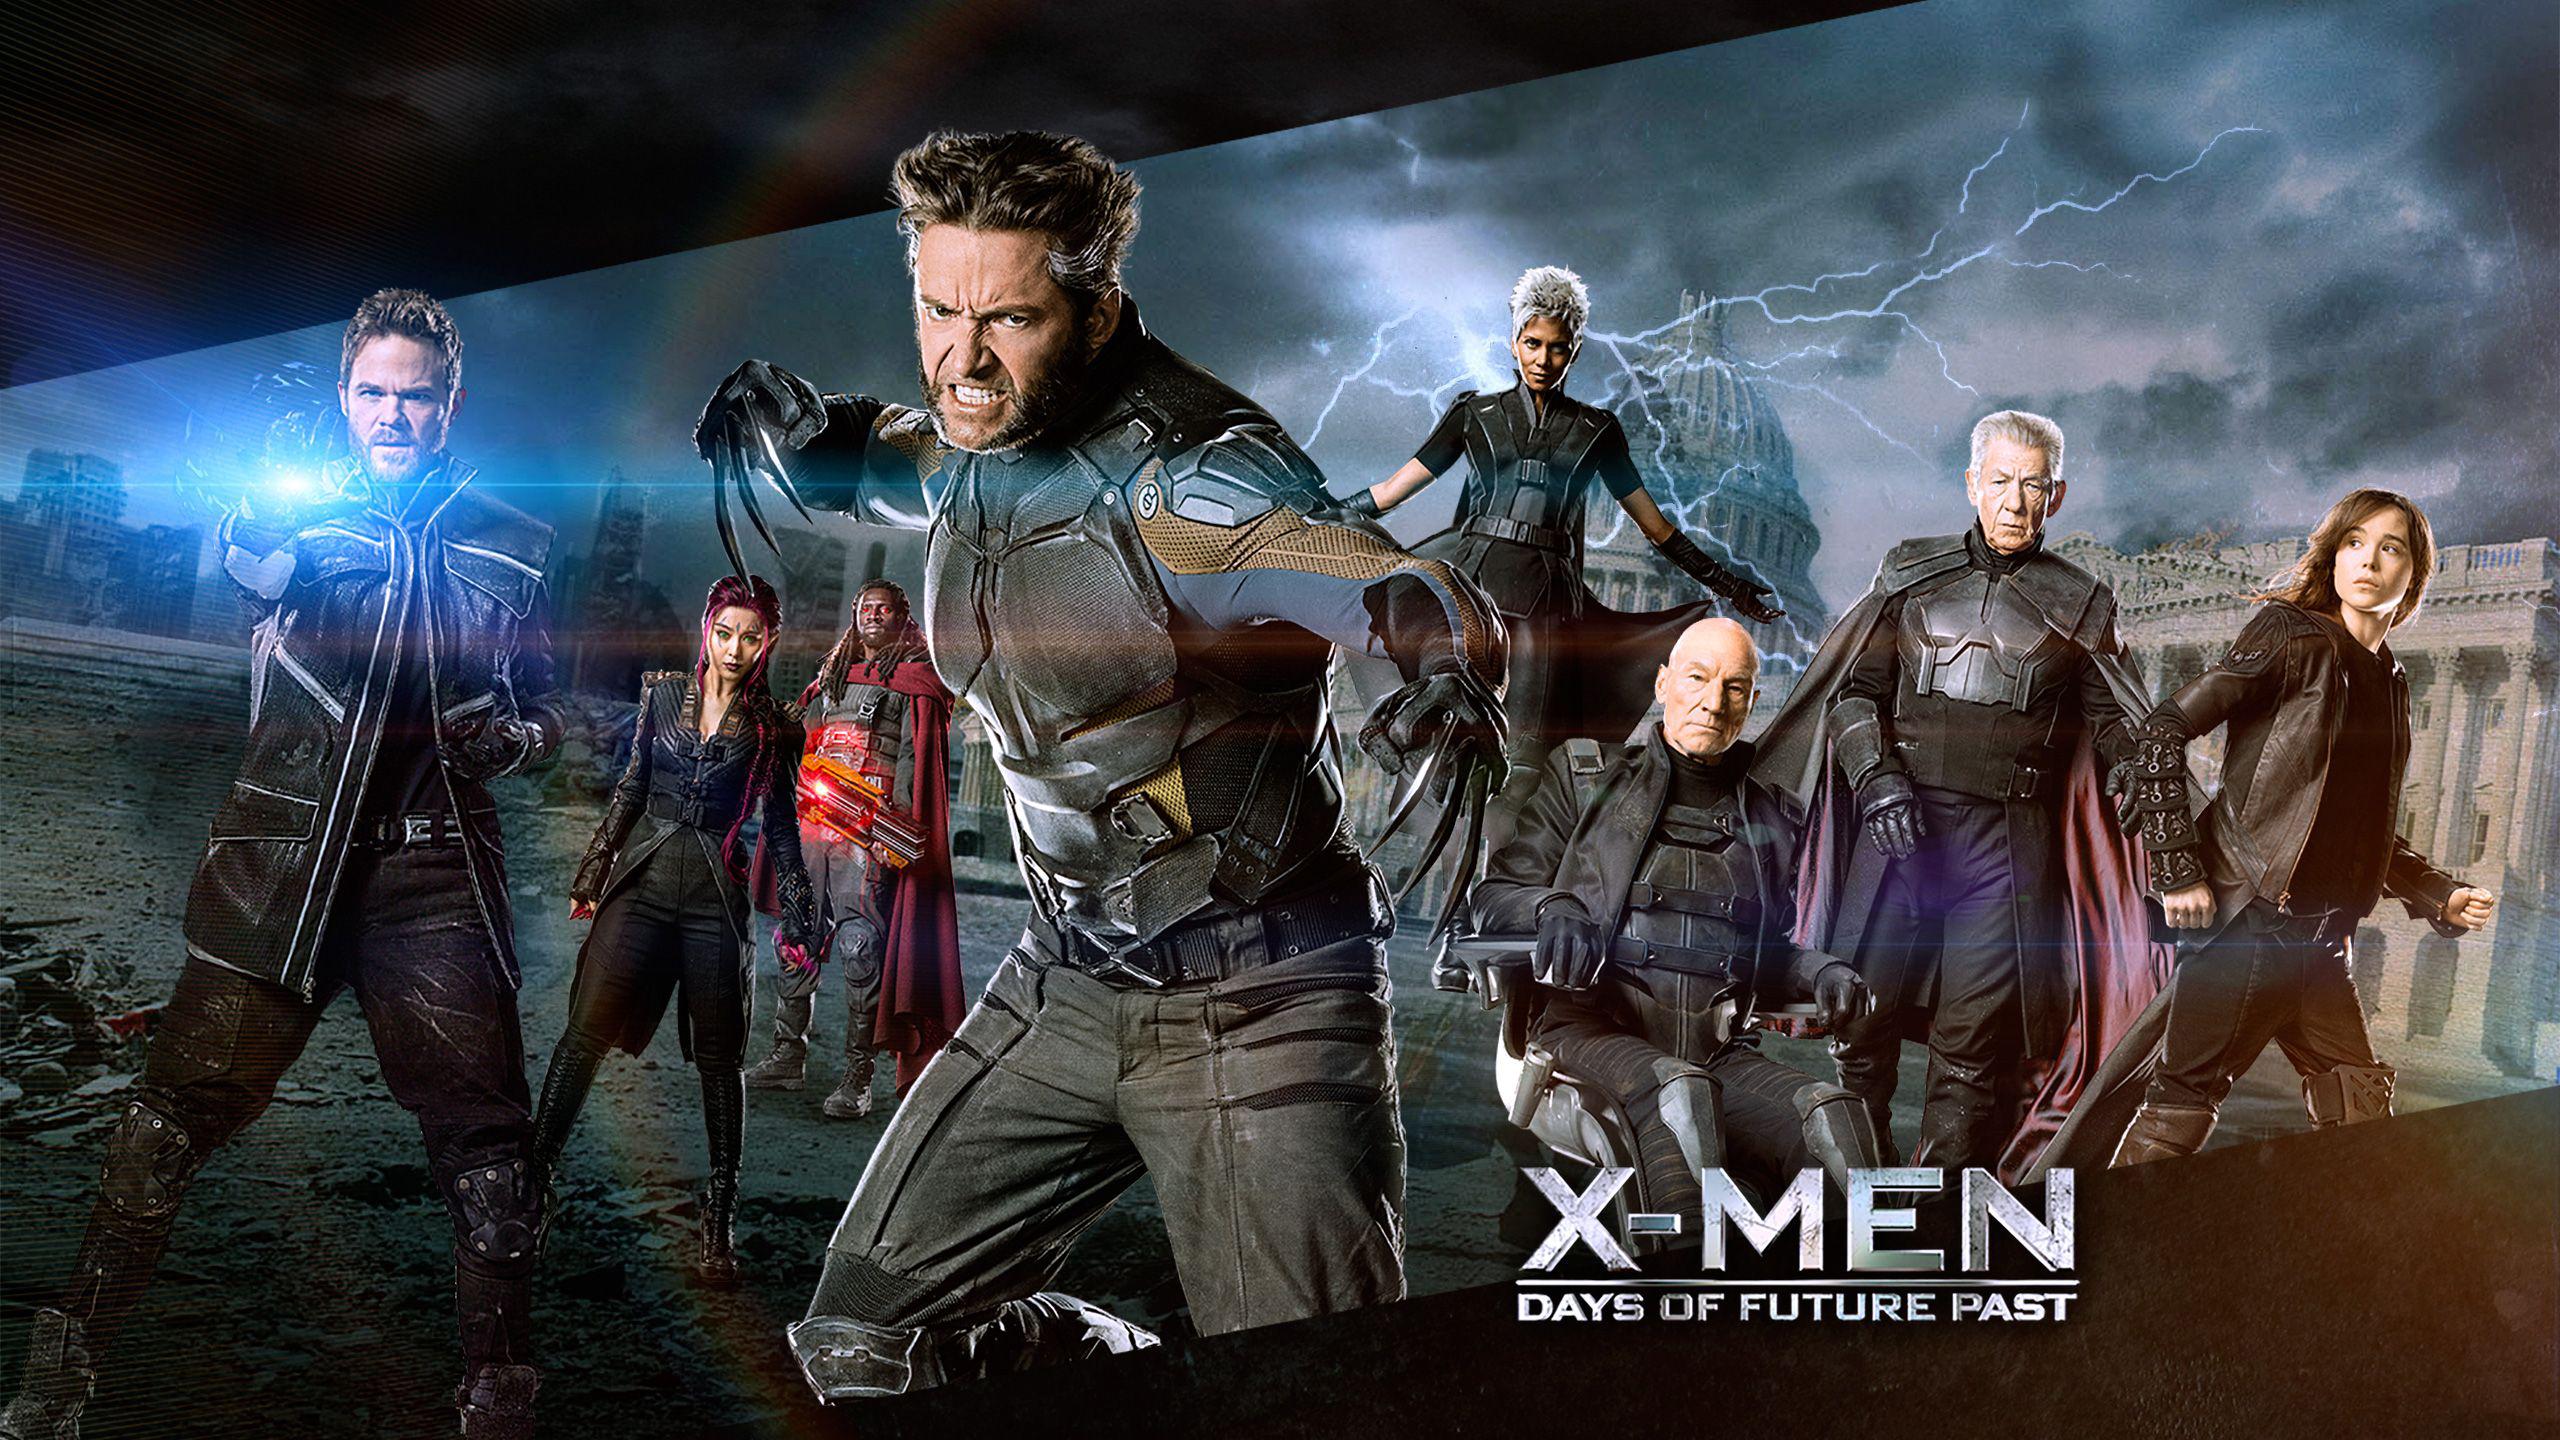 X-Men Days of Future Past wallpaper 2